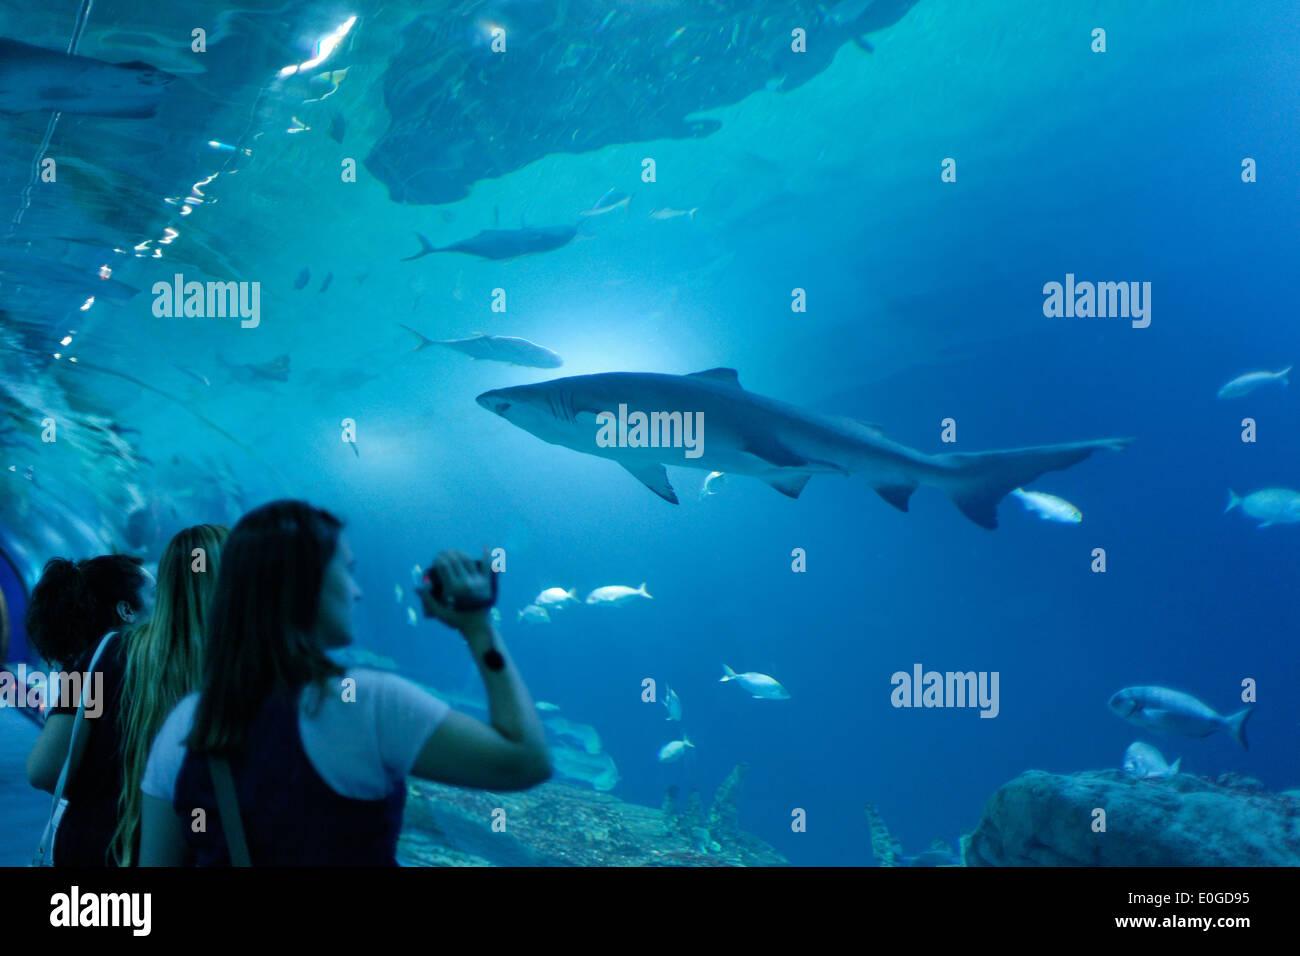 Aquarium des requins, L'Oceanografic, le plus grand aquarium d'Europe, province de Valence, Valence, Espagne Photo Stock